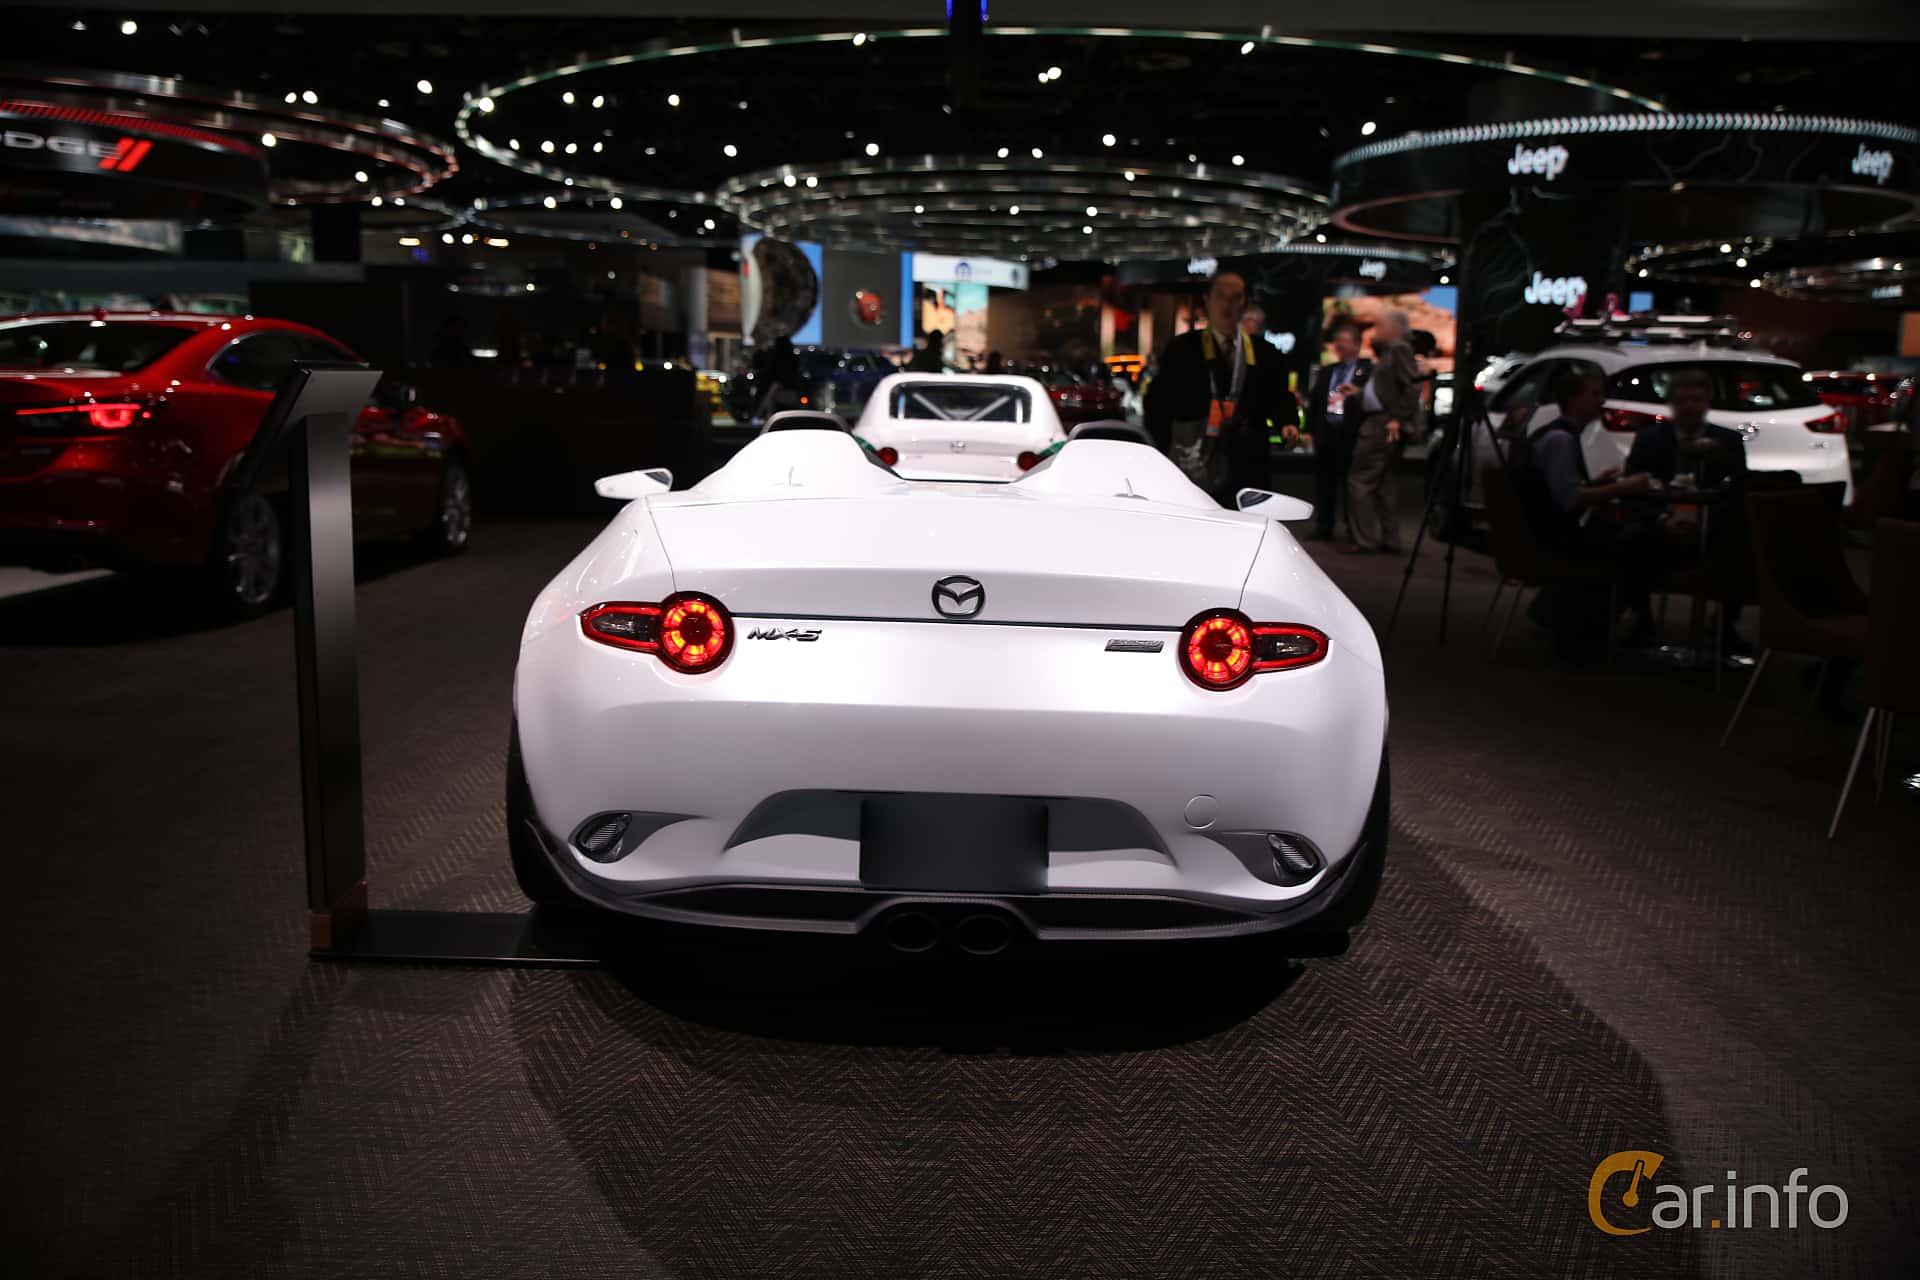 https://s.car.info/image_files/1920/mazda-mx-5-miata-speedster-evolution-back-north-american-international-auto-show-2017-2-318262.jpg